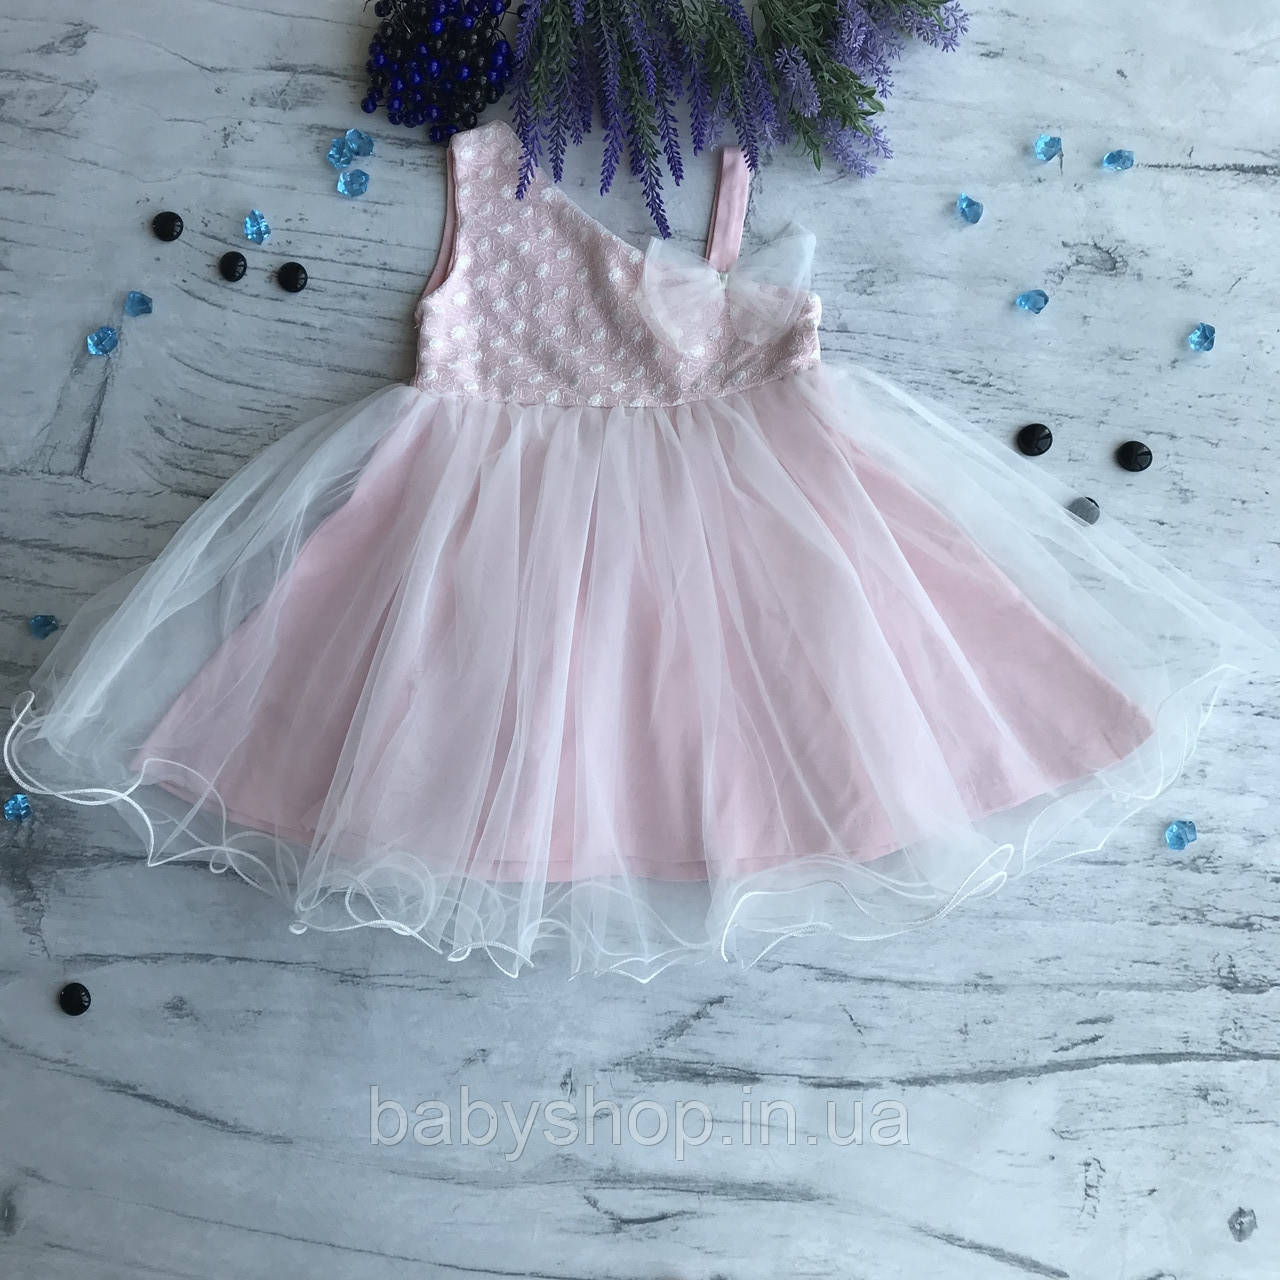 Летнее платье на девочку Breeze 312. Размер 98 см, 104 см, 110 см, 116 см, 128 см